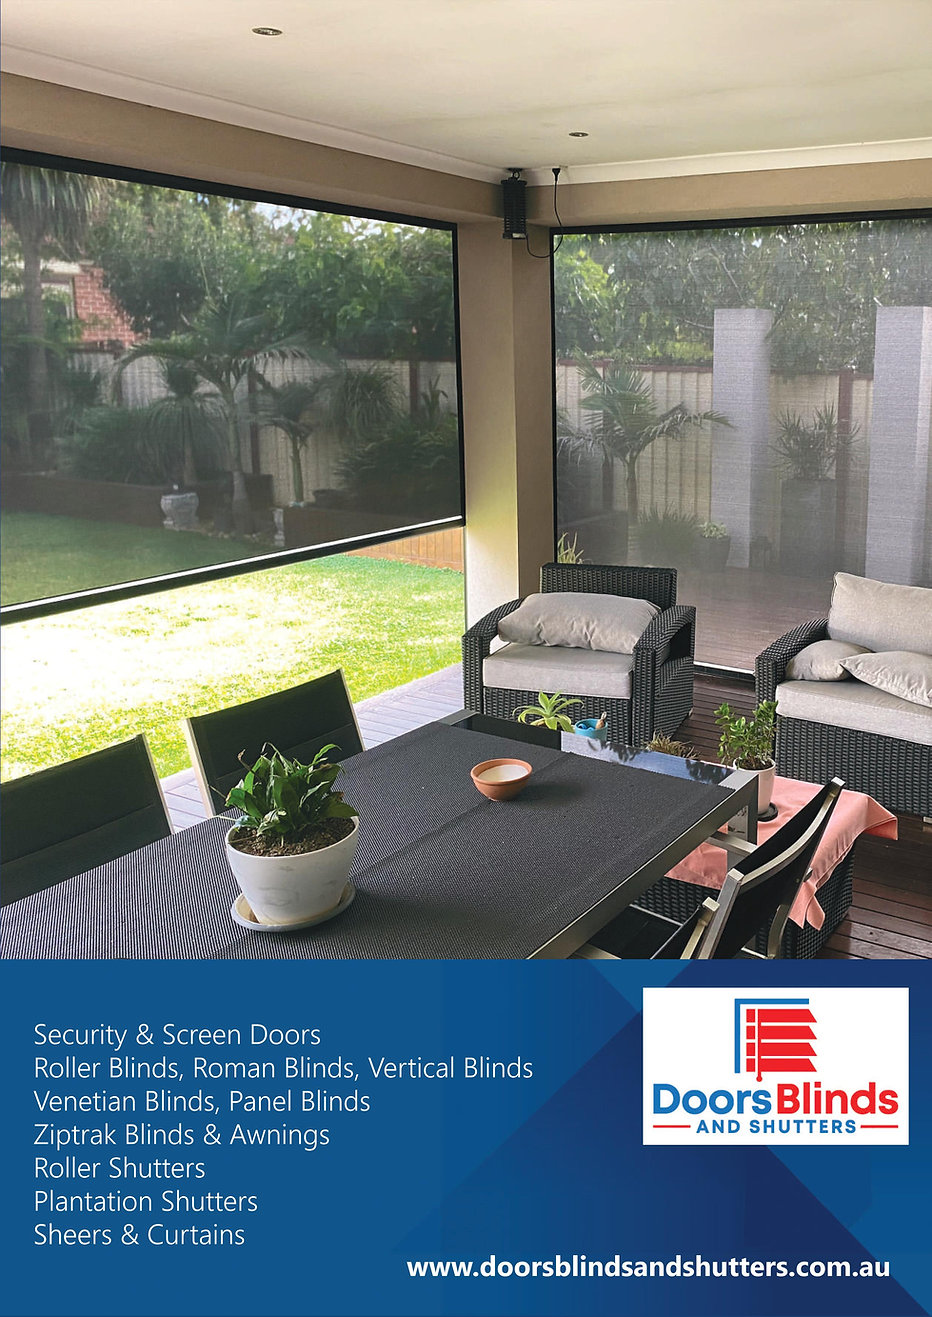 Doors Blinds and Shutters Brochure